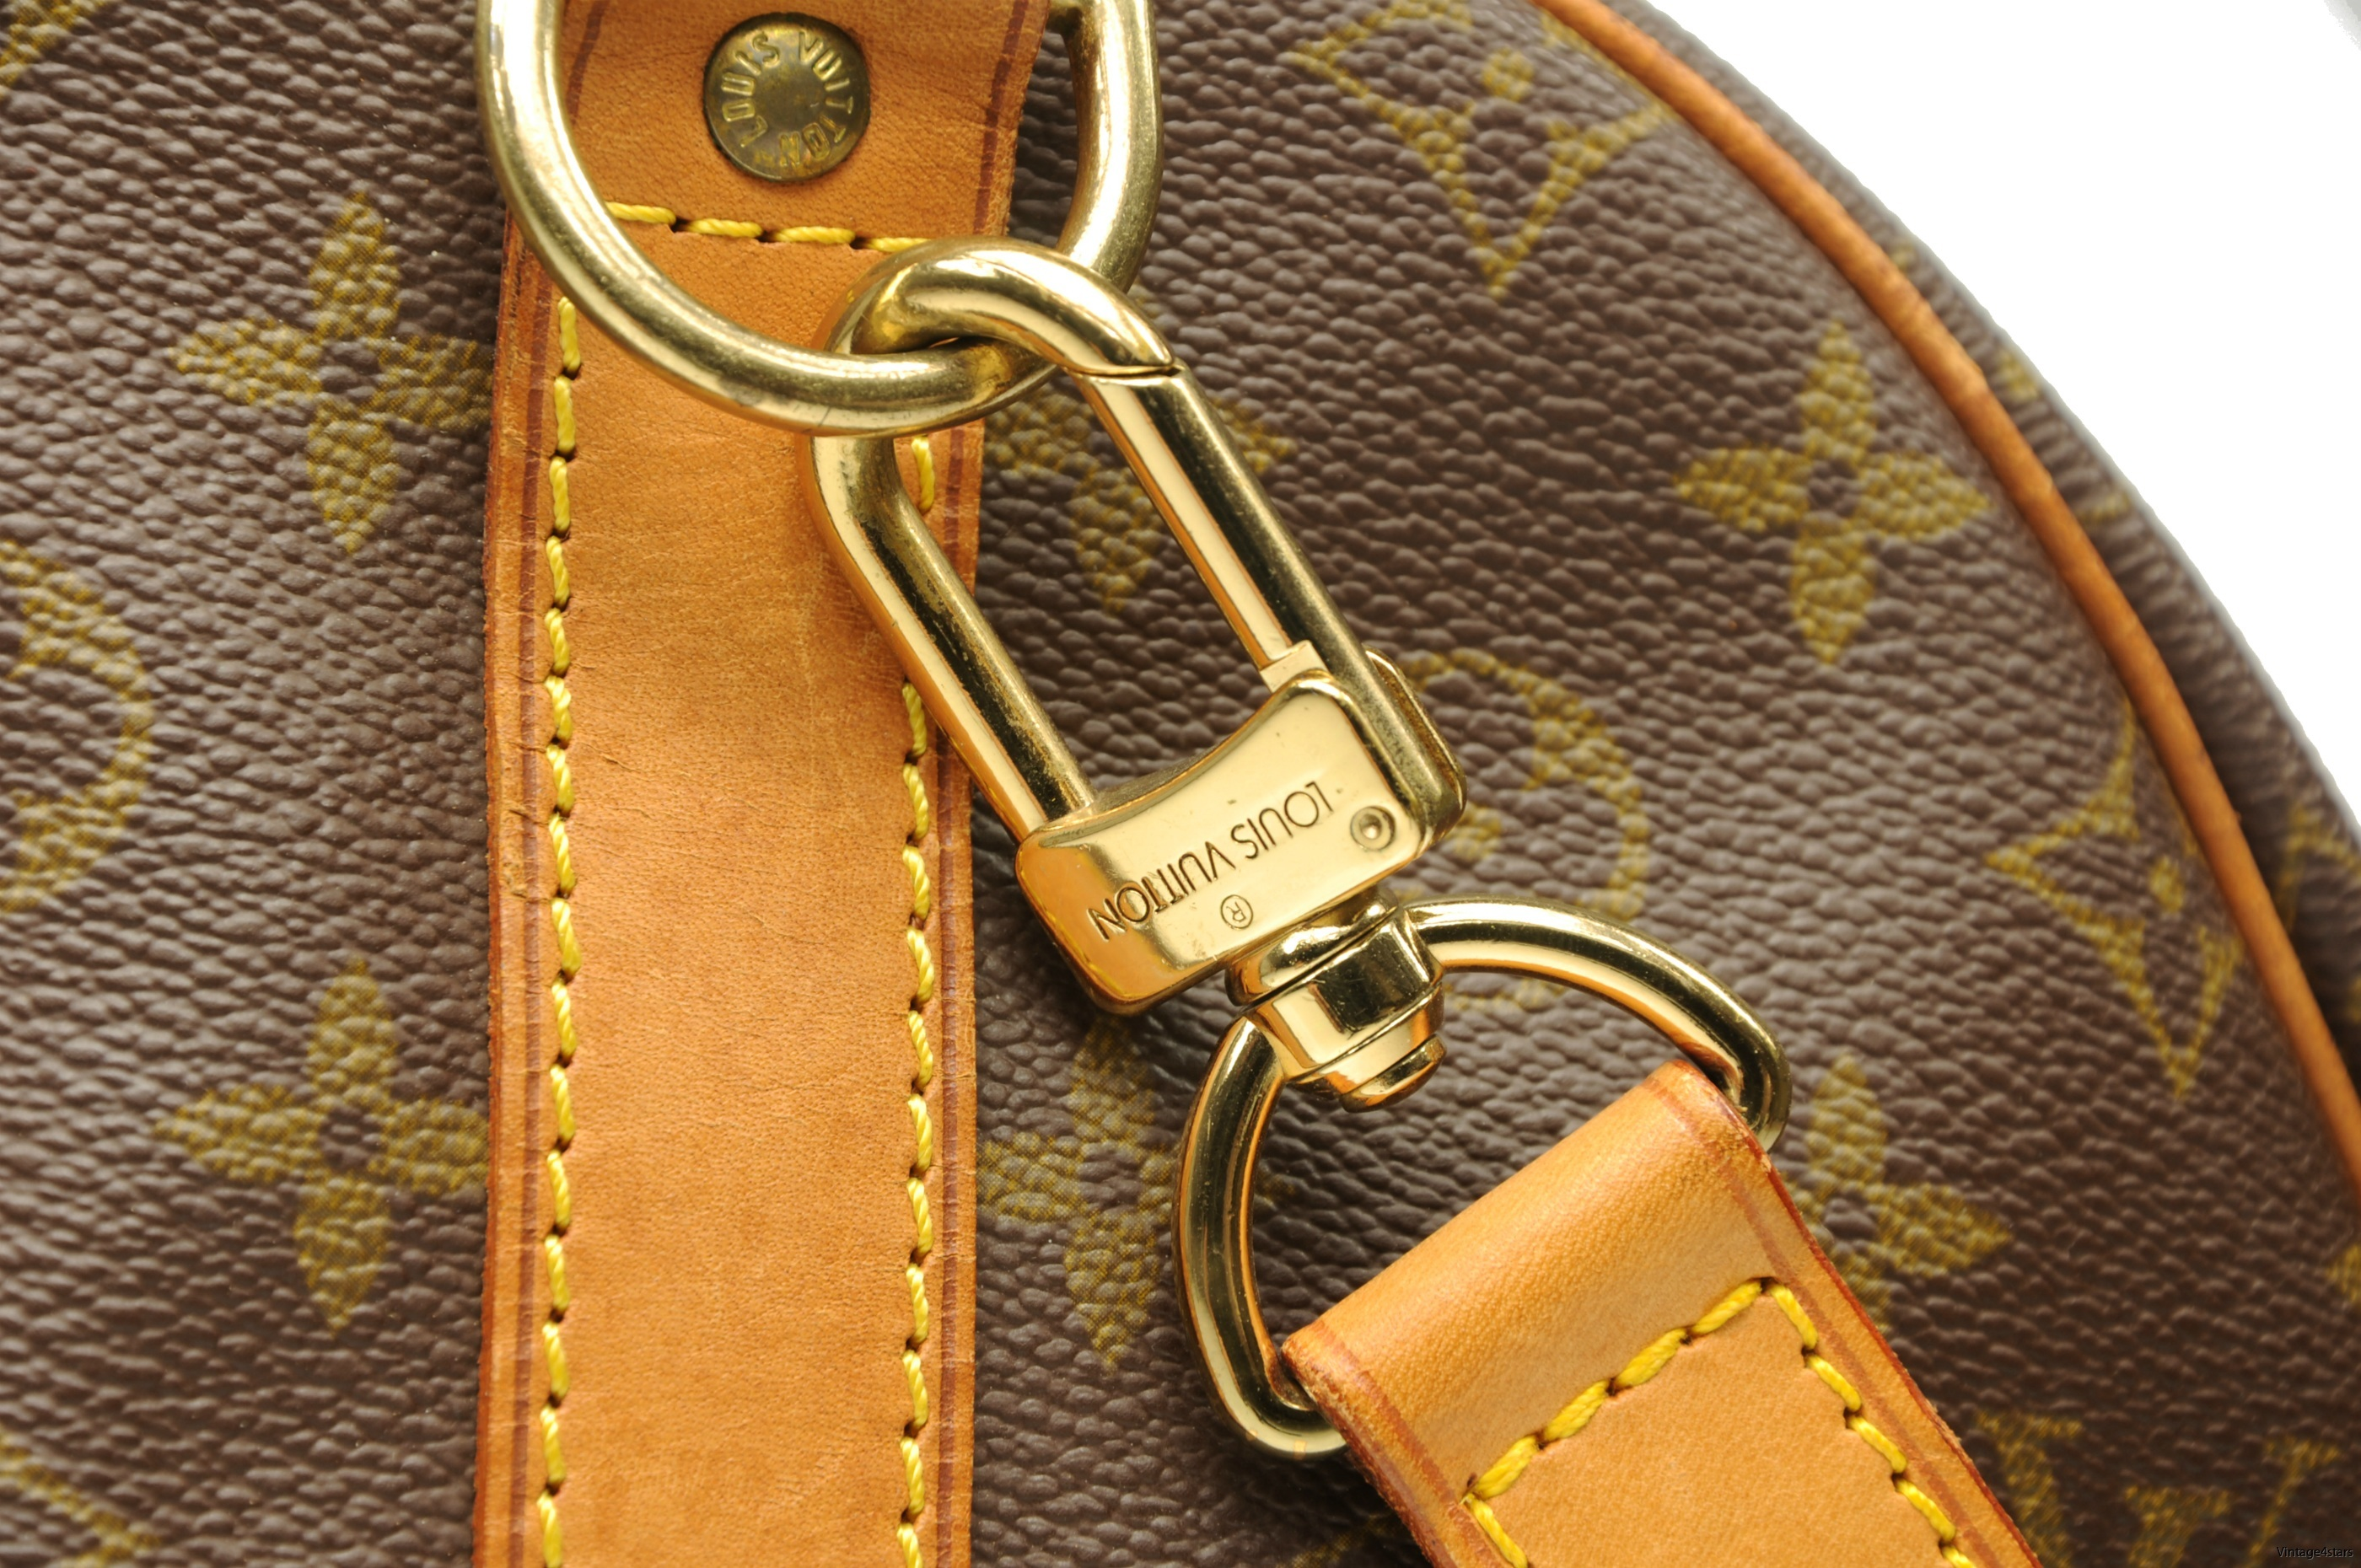 Louis Vuitton Keepall 55 Monogram 5